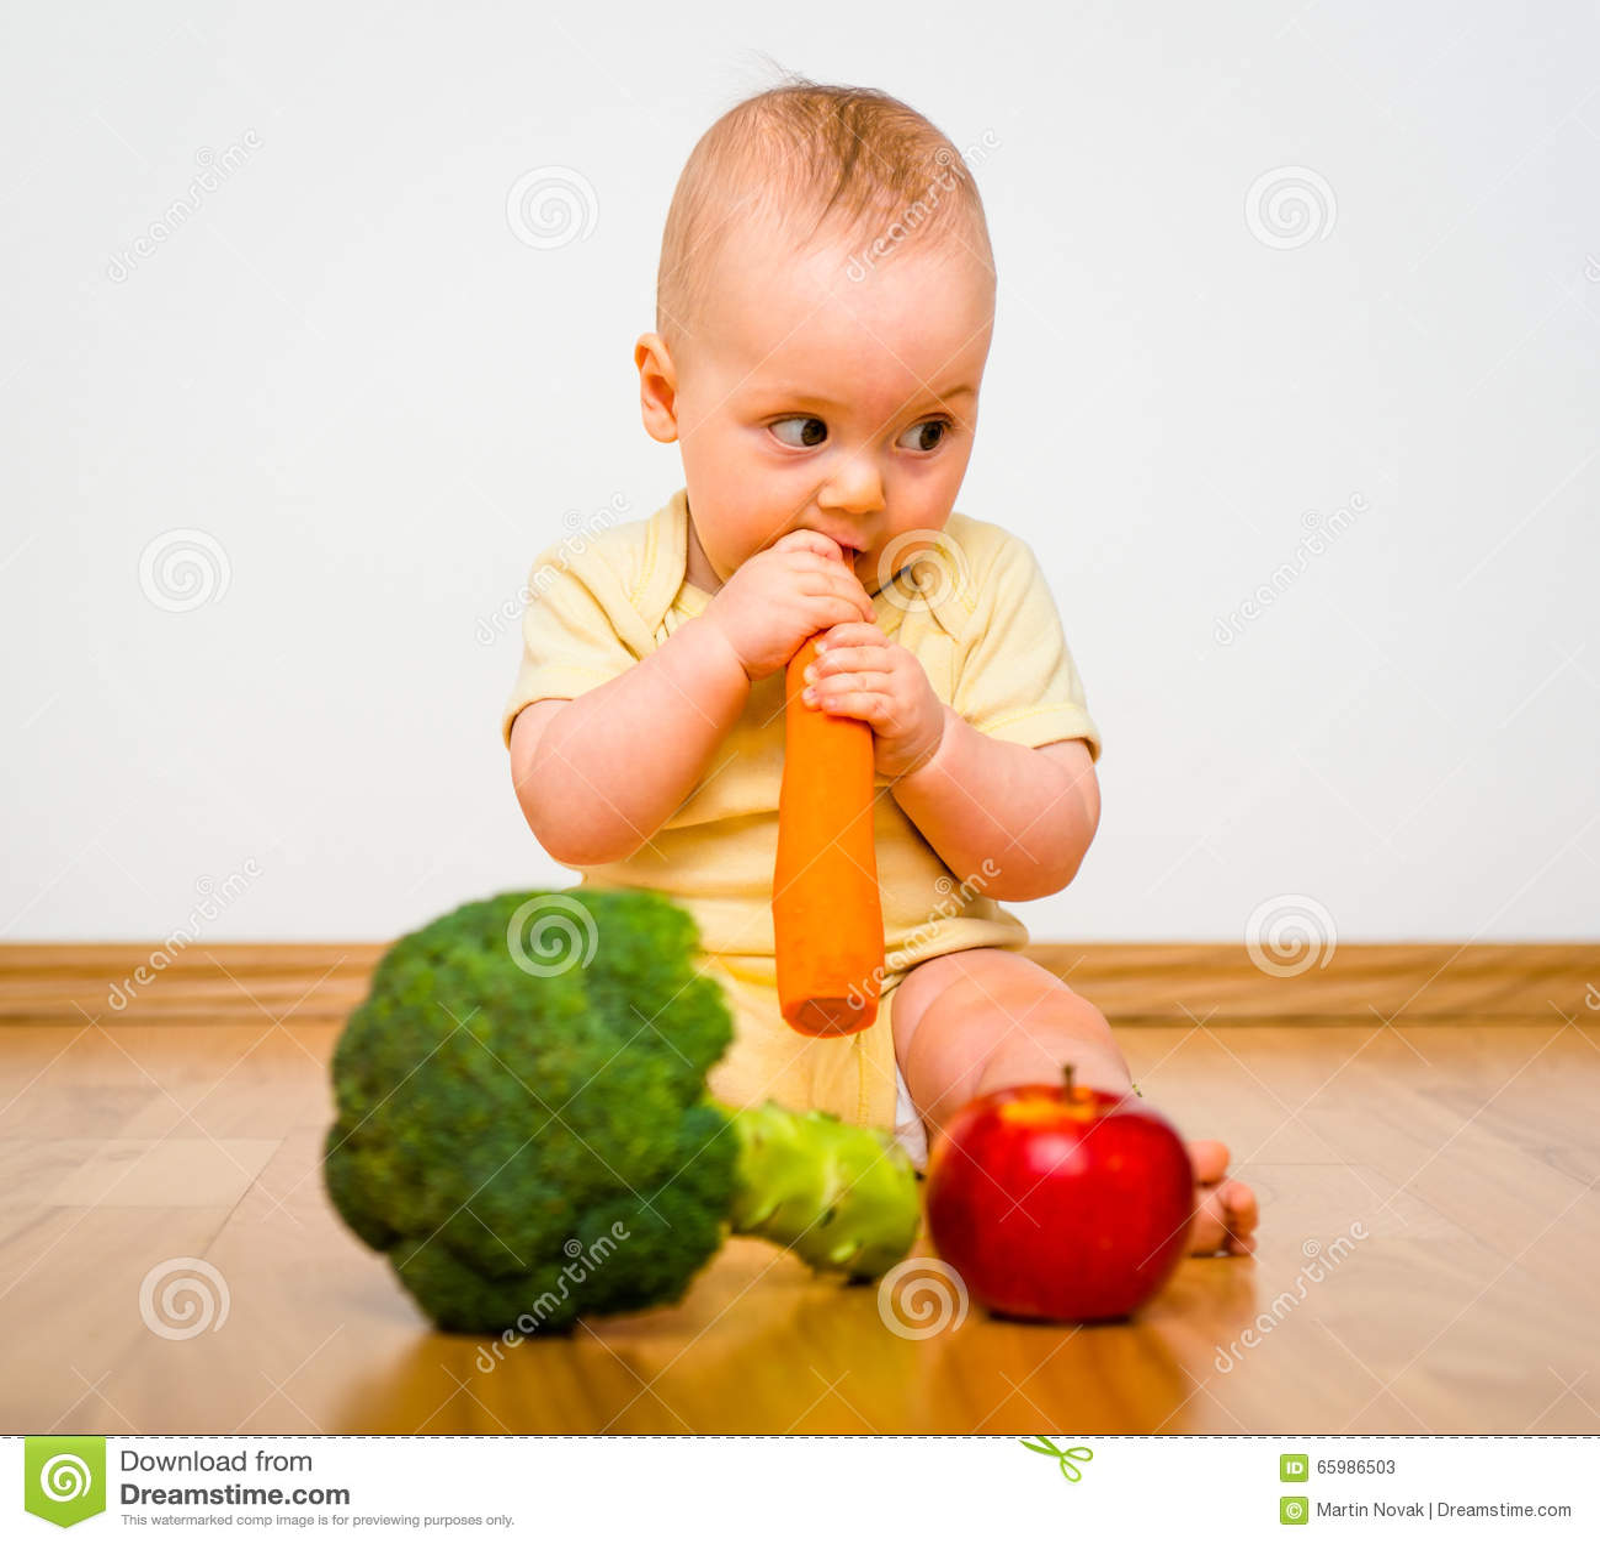 fruits for healthy living i fruit